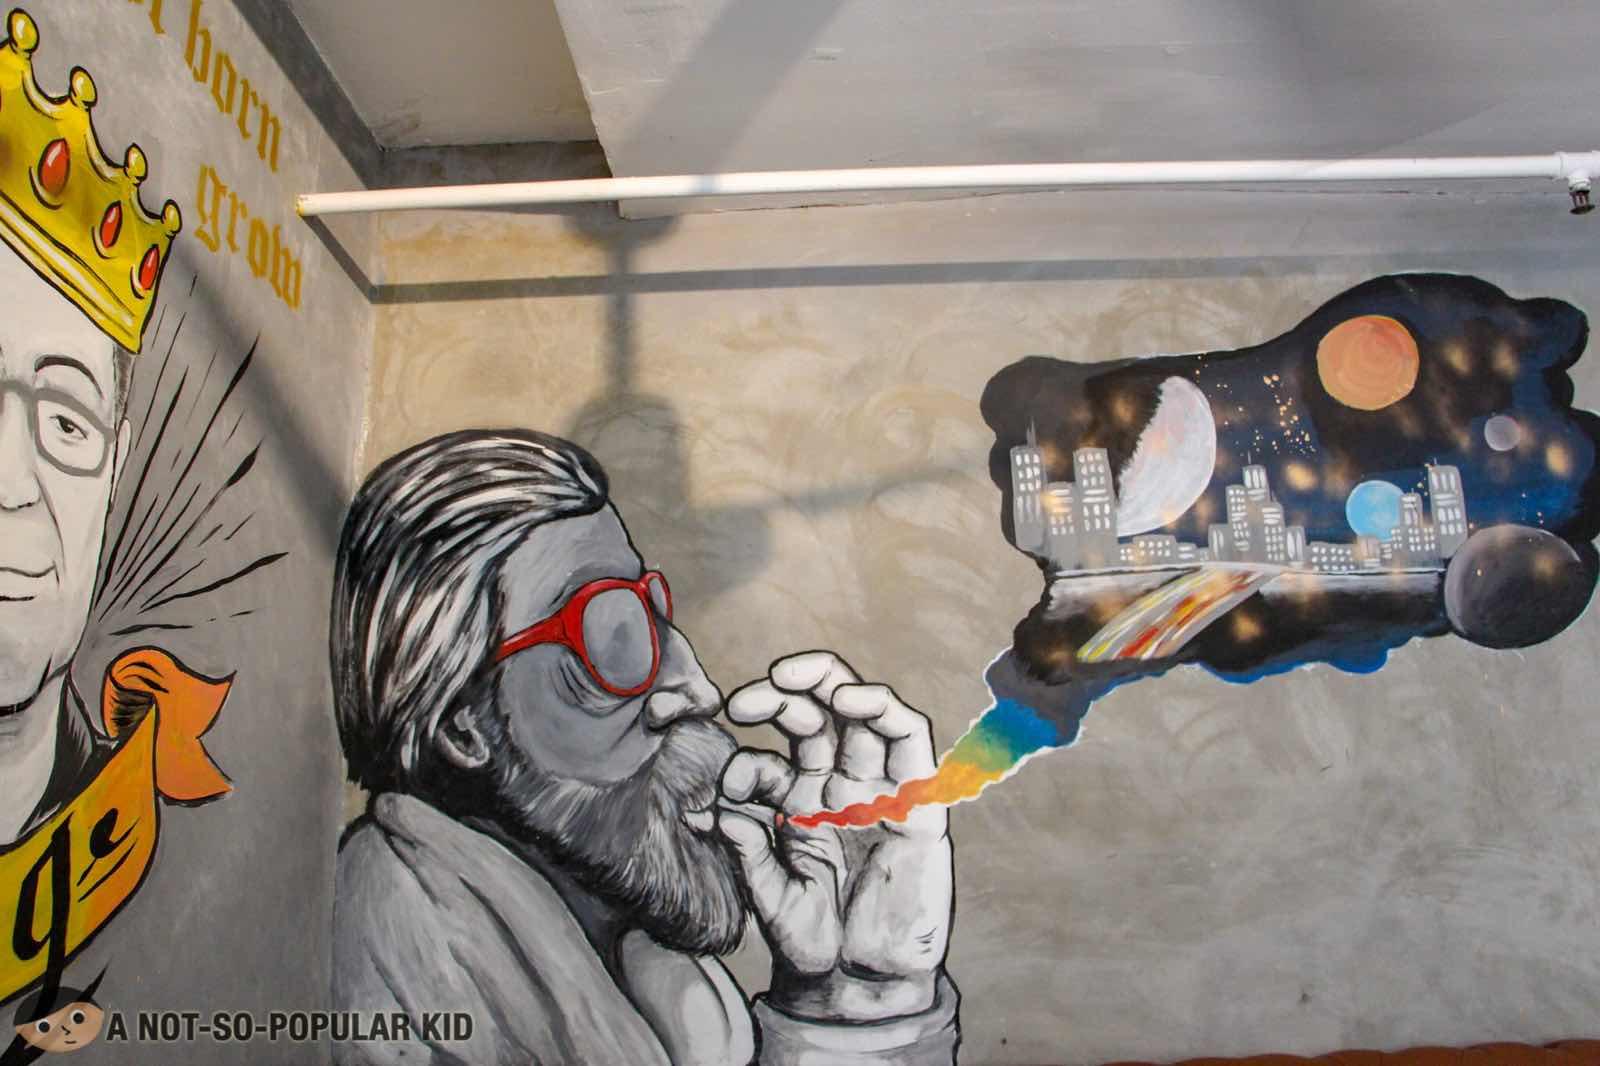 Brilliantly made interior of Kite Kebab Bar in Tordesillas